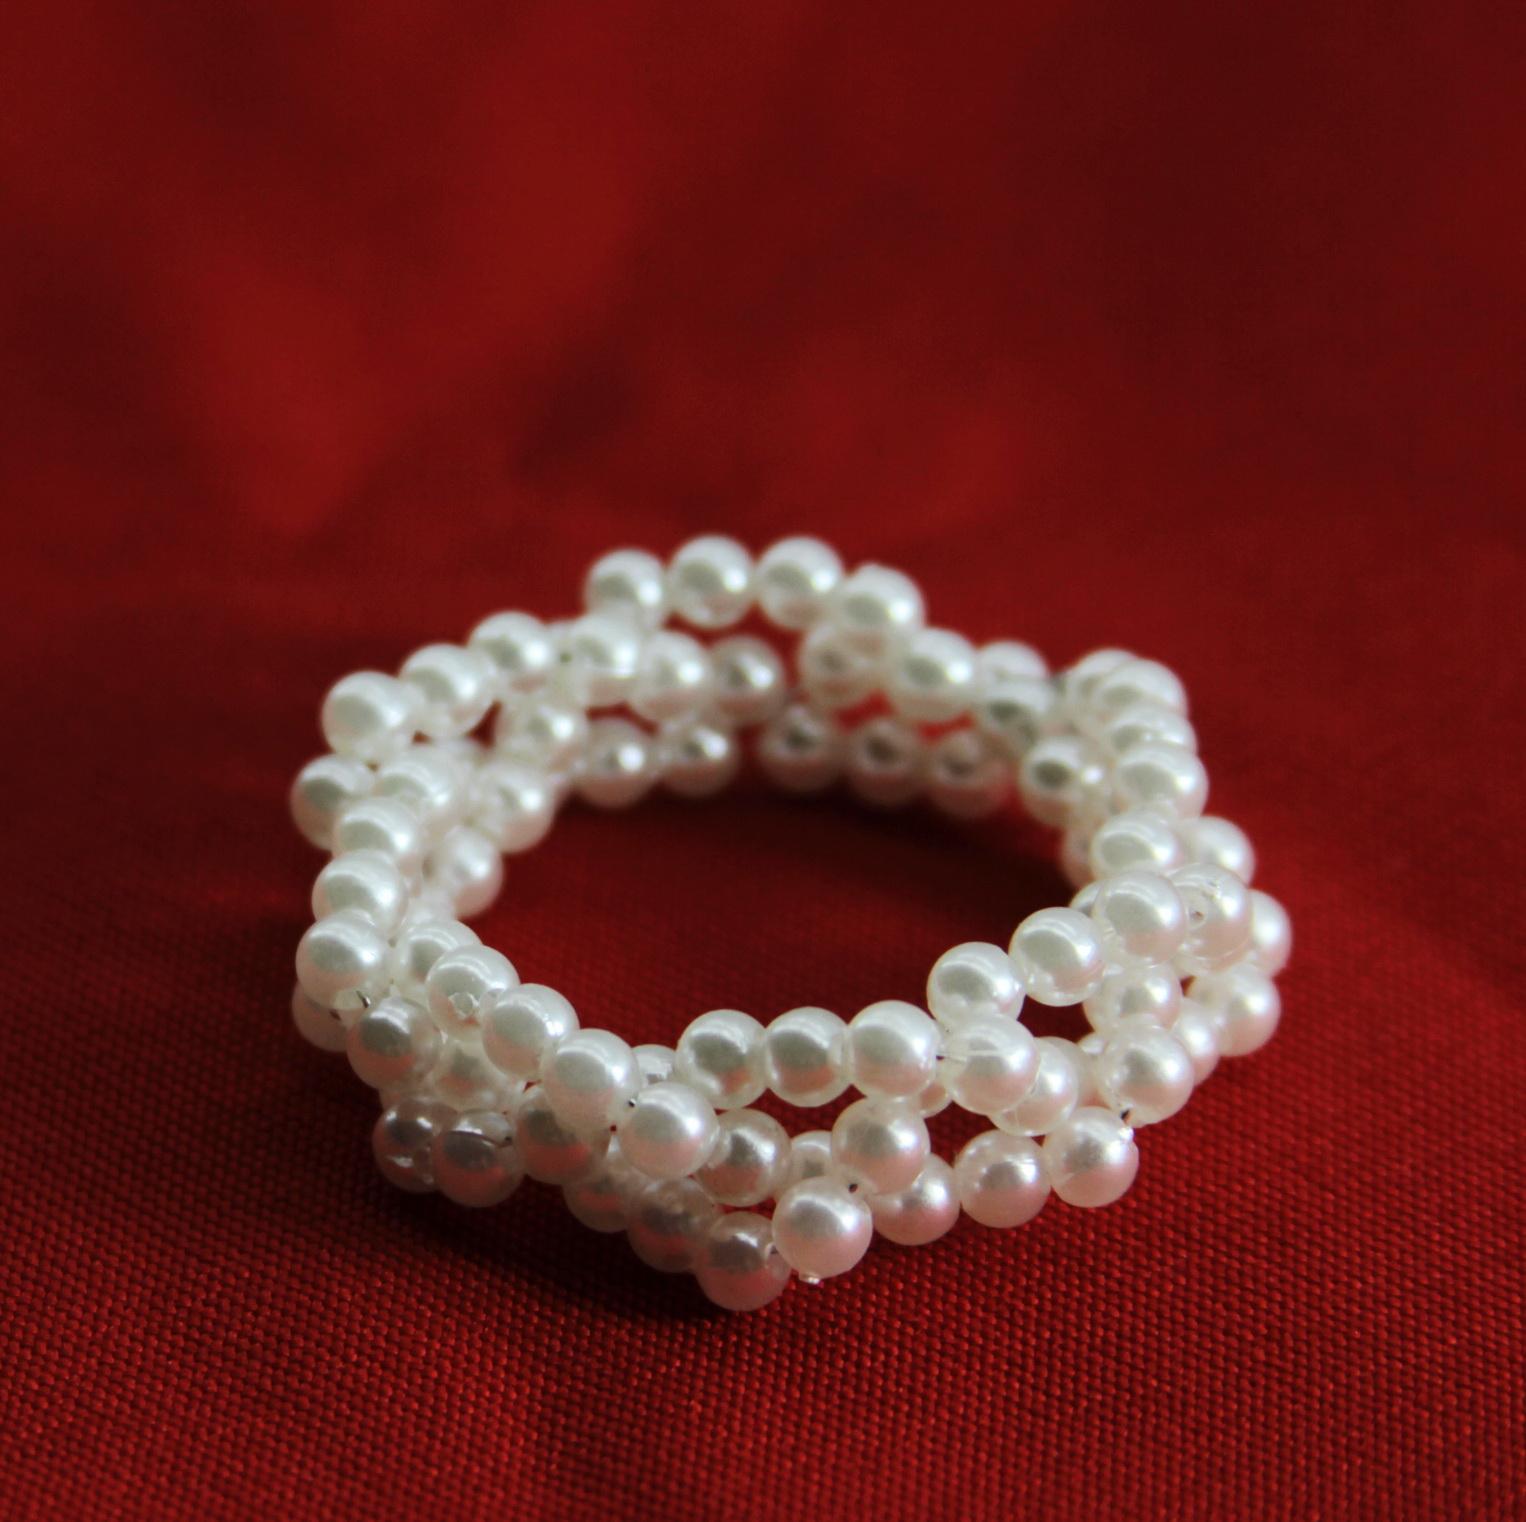 Pearl Chain Napkin Ring Wedding Napkin Holder Qn19052201 Buy Napkin Rings For Weddings Beaded Napkin Ring Cheap Napkin Rings Product On Alibaba Com